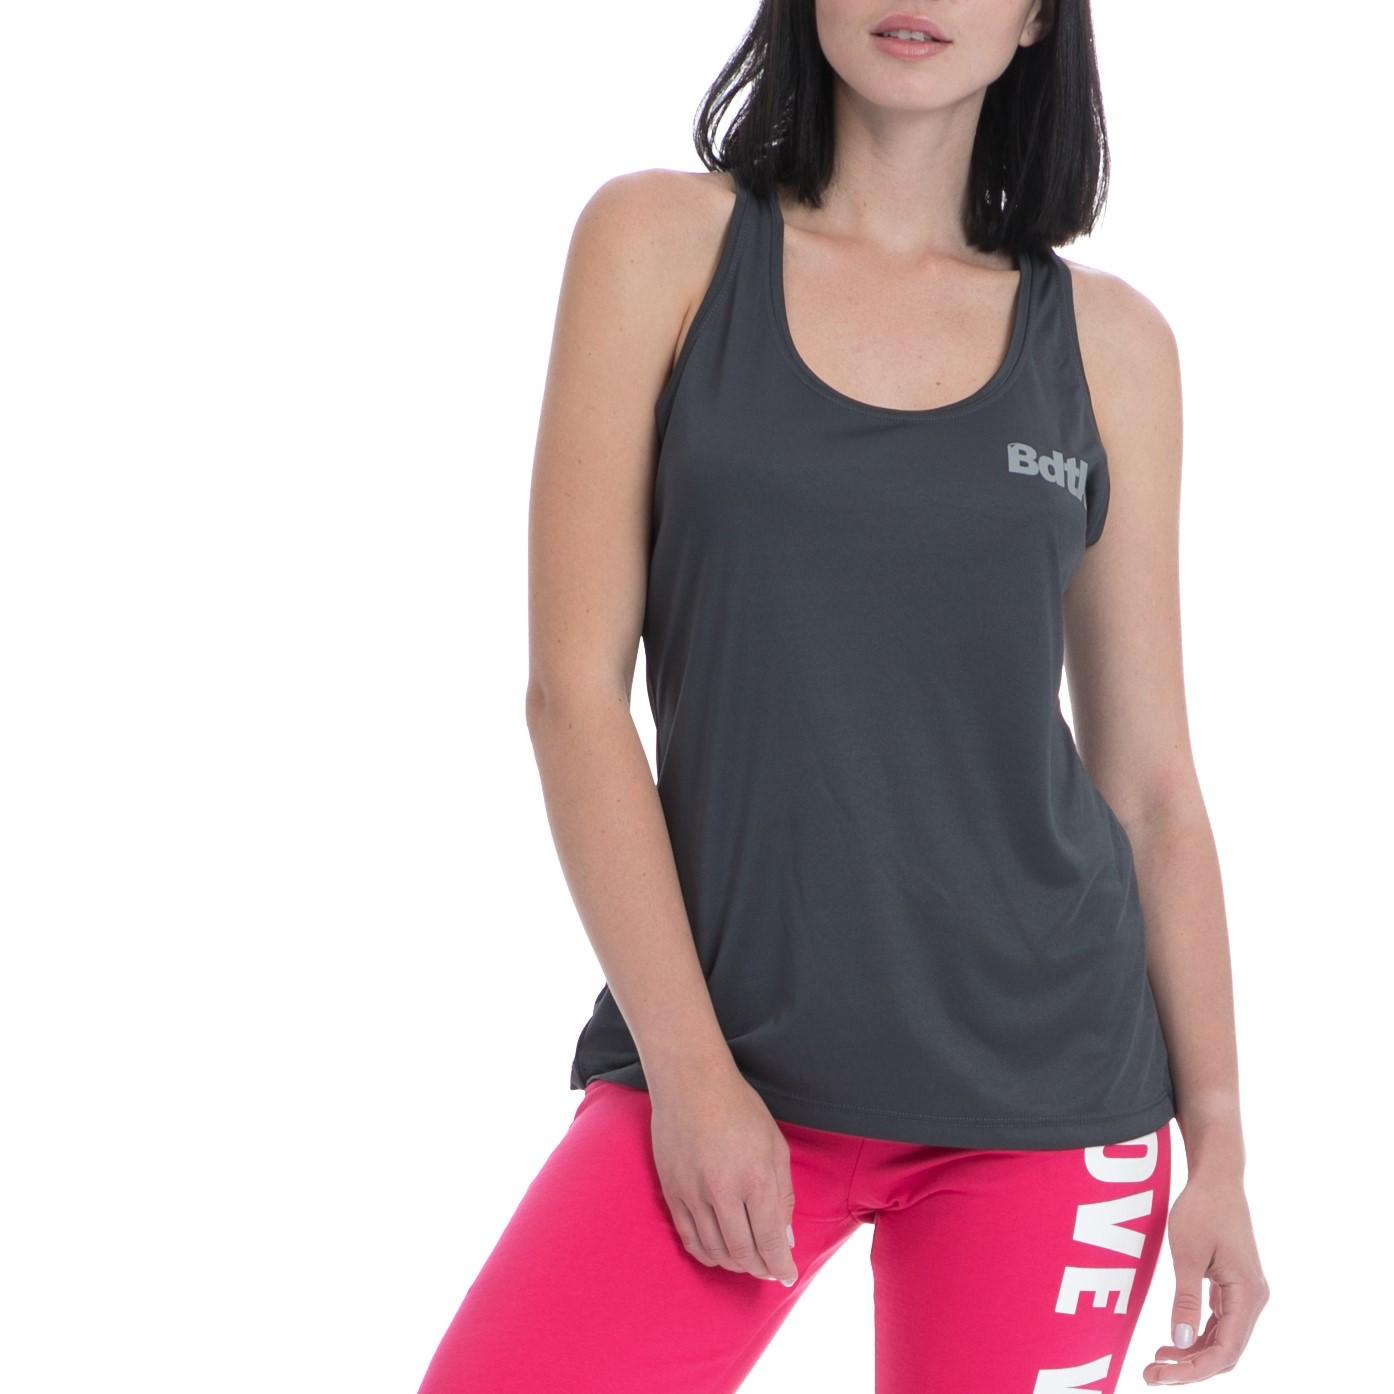 BODYTALK - Γυναικεία αμάνικη μπλούζα BODYTALK γκρι γυναικεία ρούχα αθλητικά t shirt τοπ